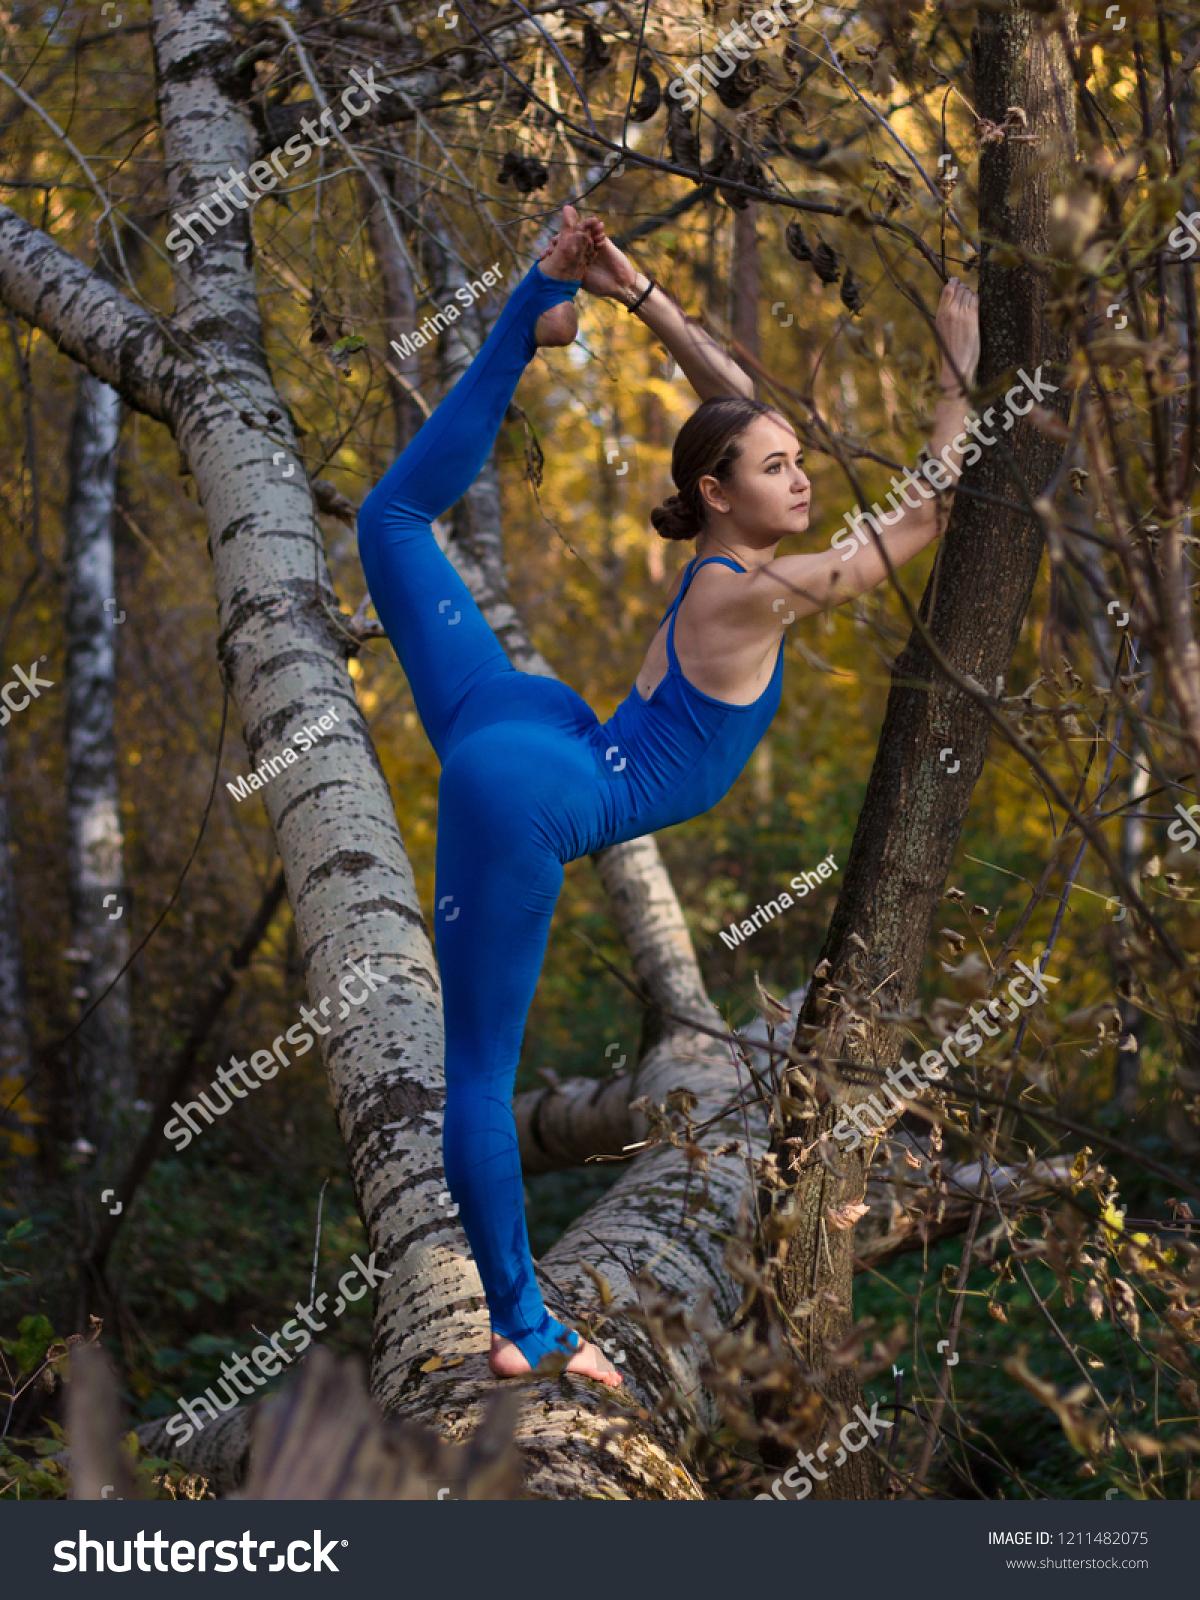 https://image.shutterstock.com/z/stock-photo-girl-doing-stretching-standing-on-the-tree-1211482075.jpg